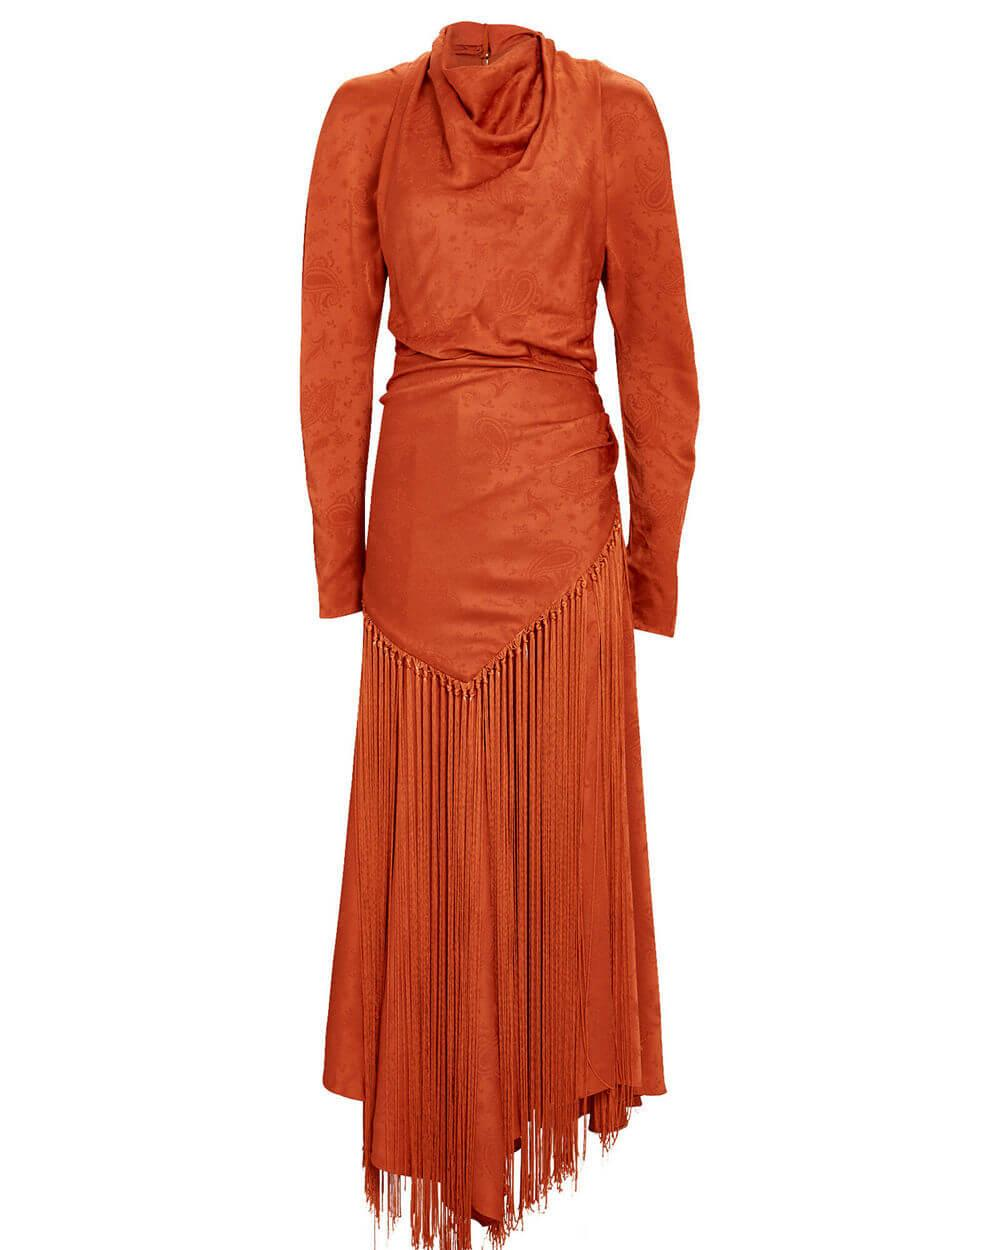 Leighton Midi Dress Item # 520-1051-R